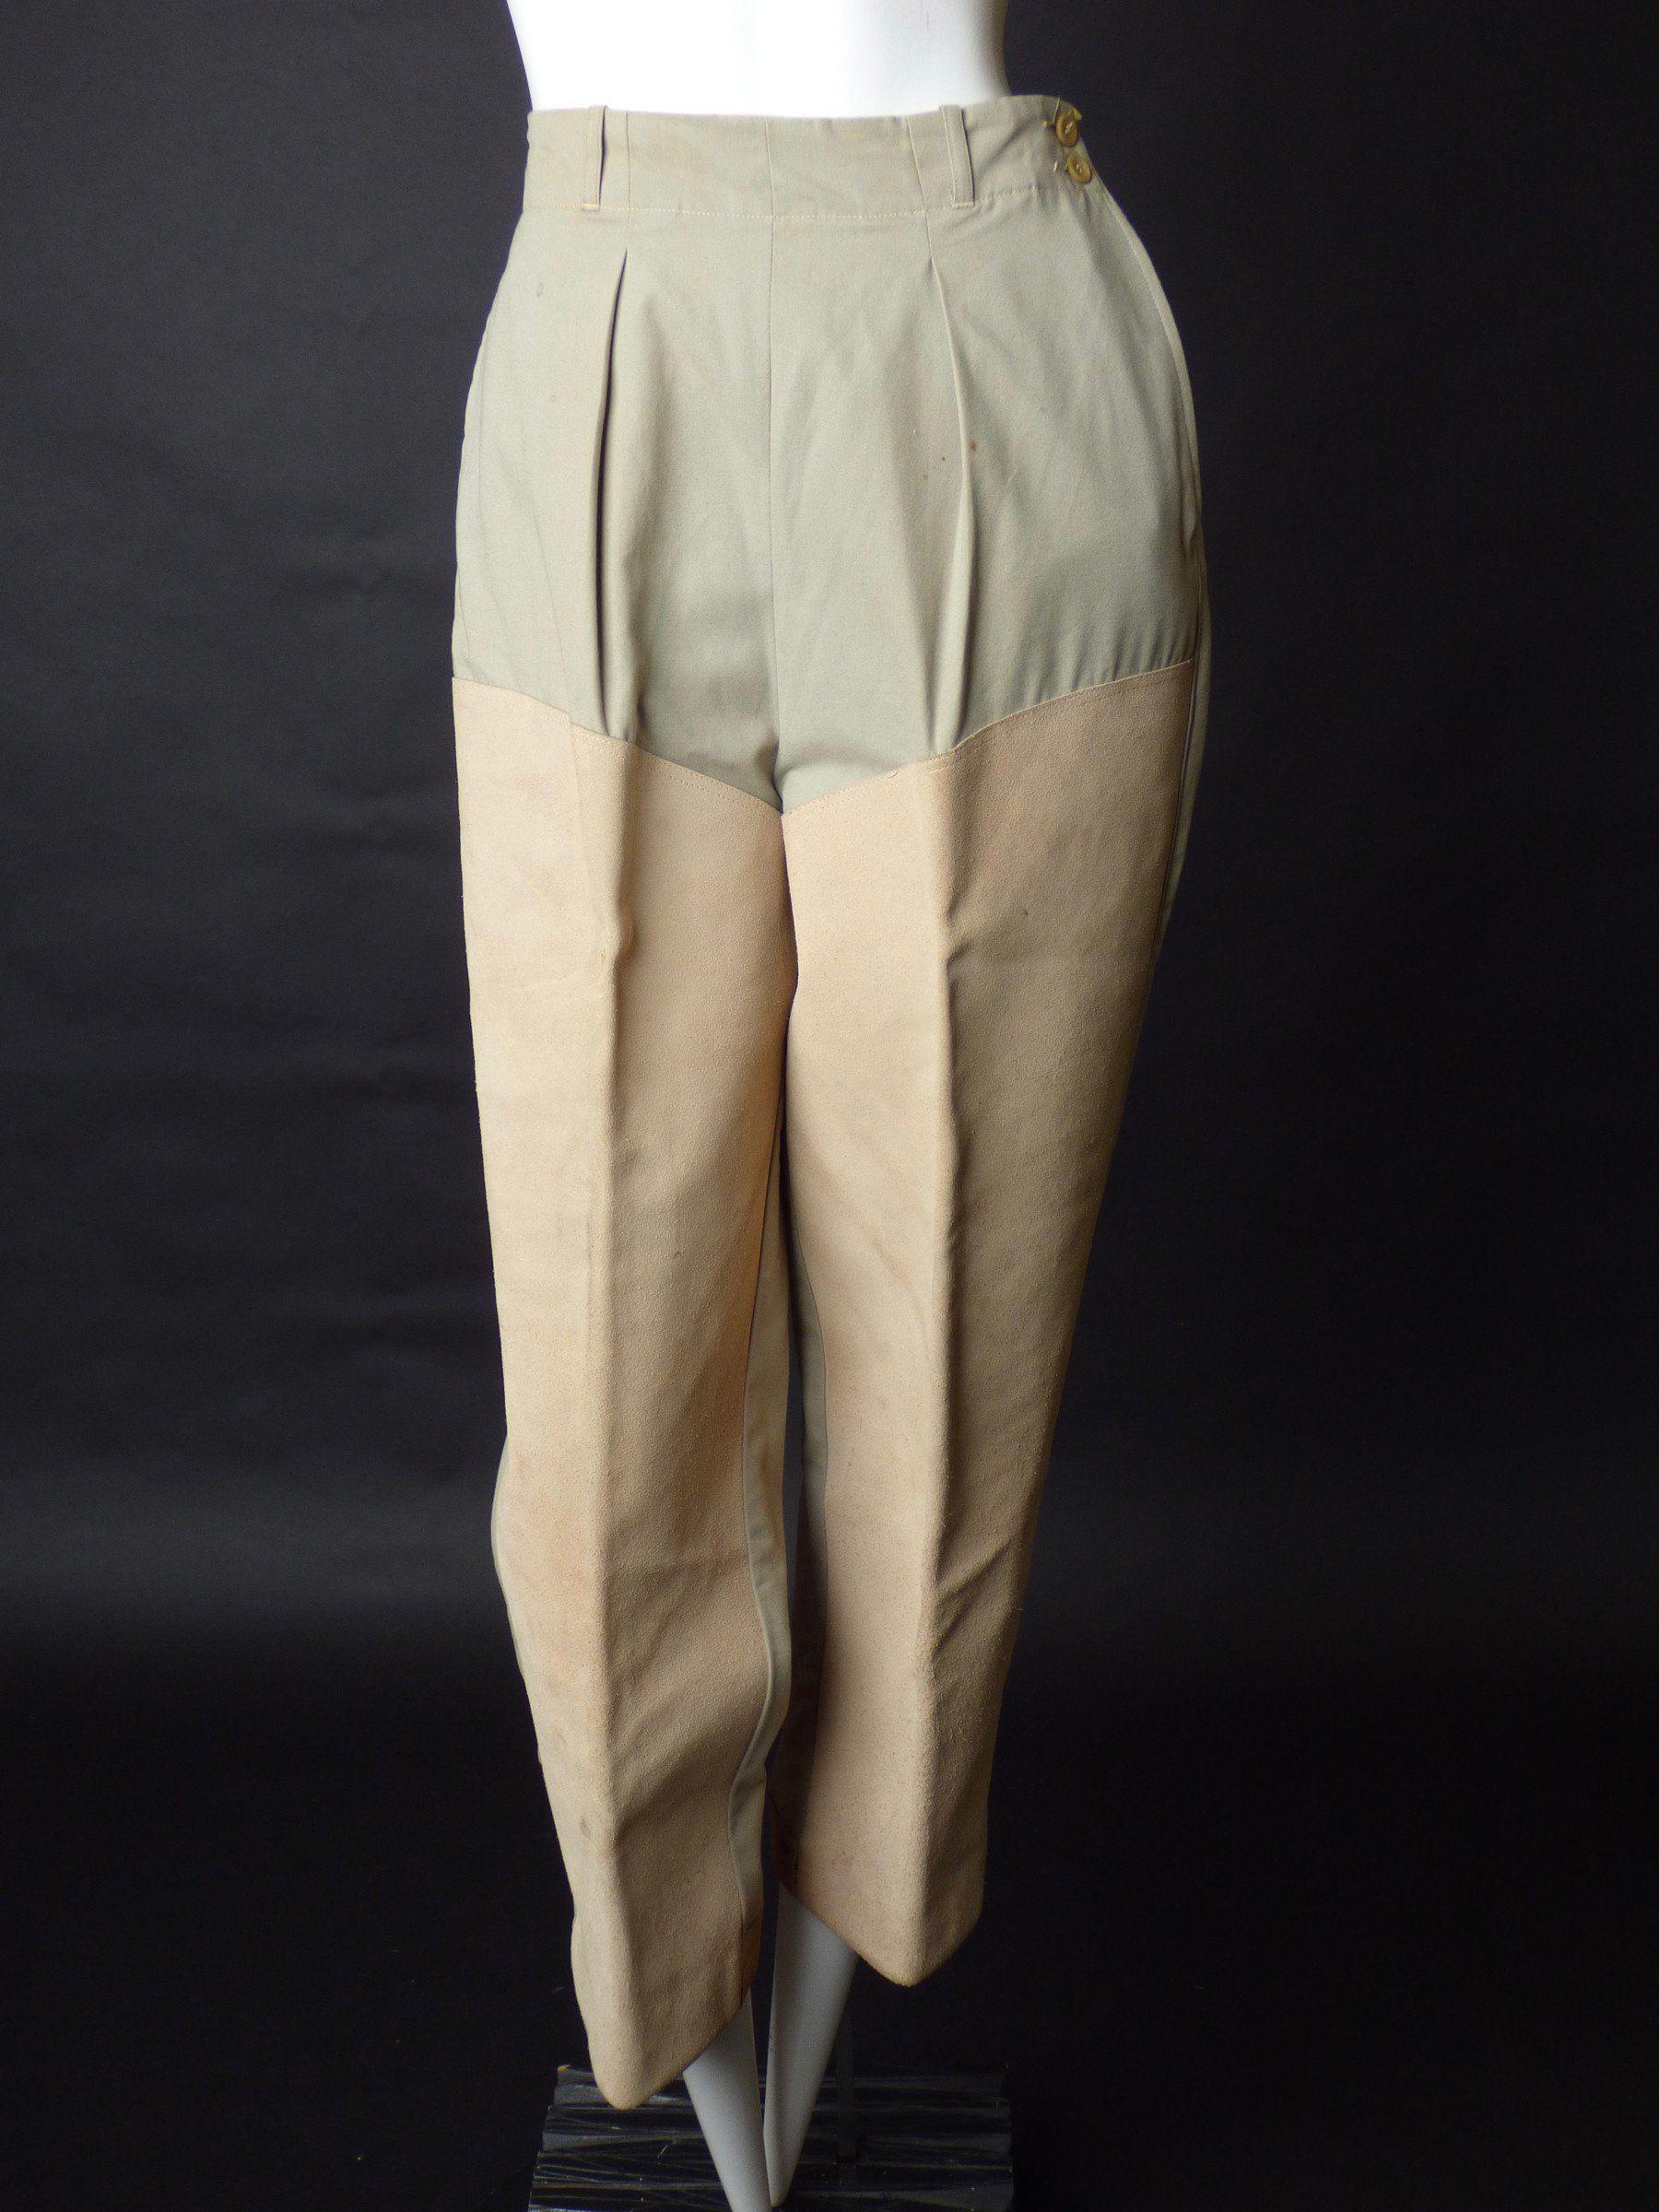 S Khaki Cotton u Suede Hunting Pants Size